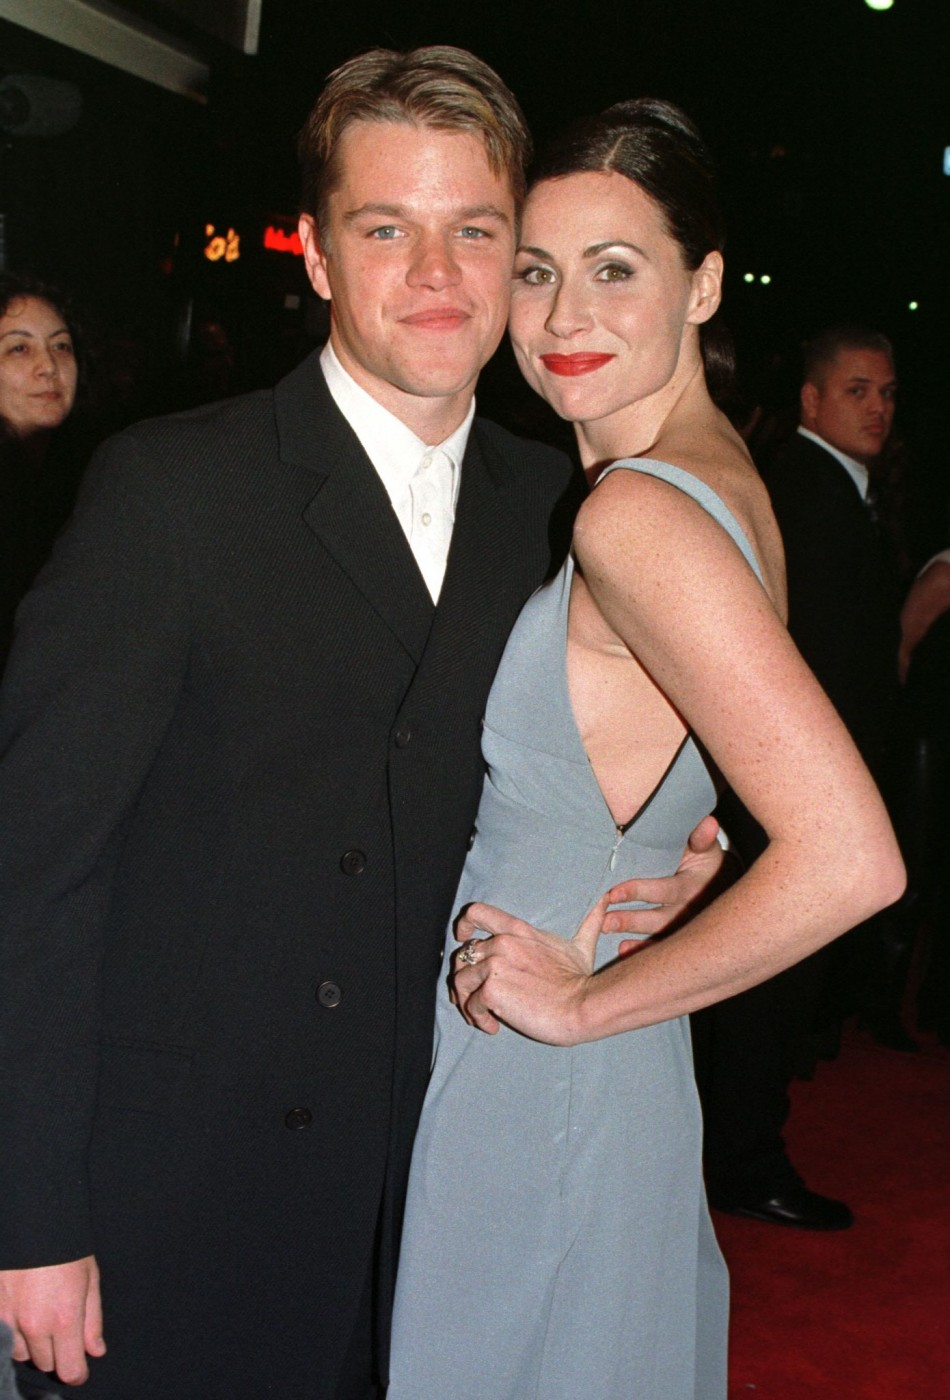 Matt Damon and Minnie Driver